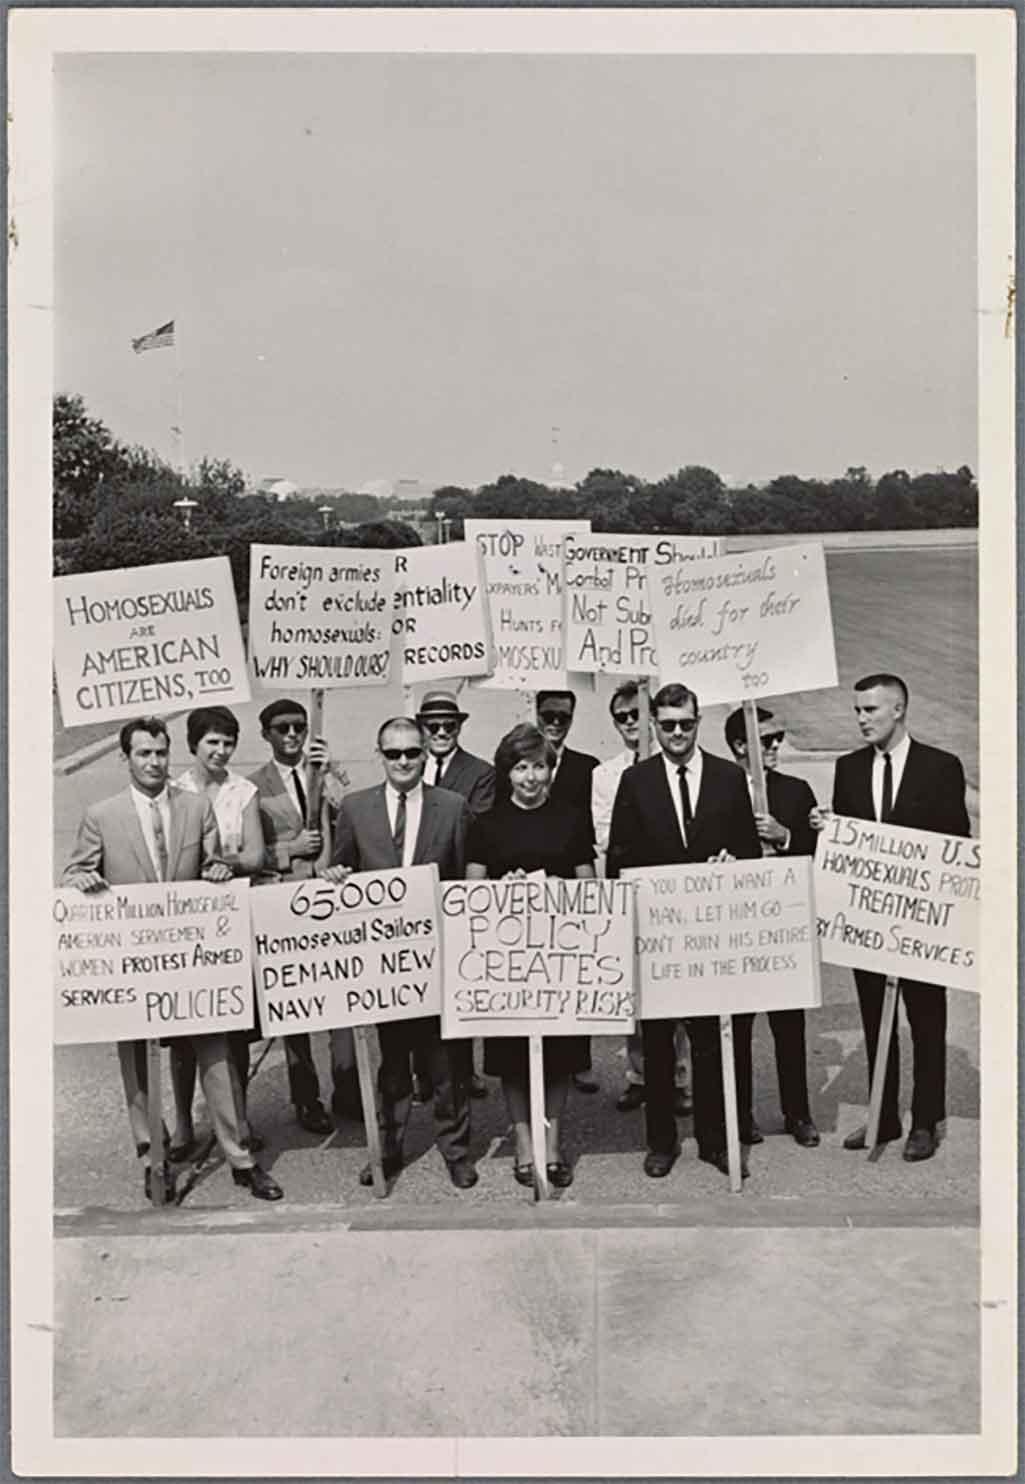 A Retrospective of LGBTQ Filmmaker and Activist Lilli Vincenz's Work - Gay Rights Picket Line